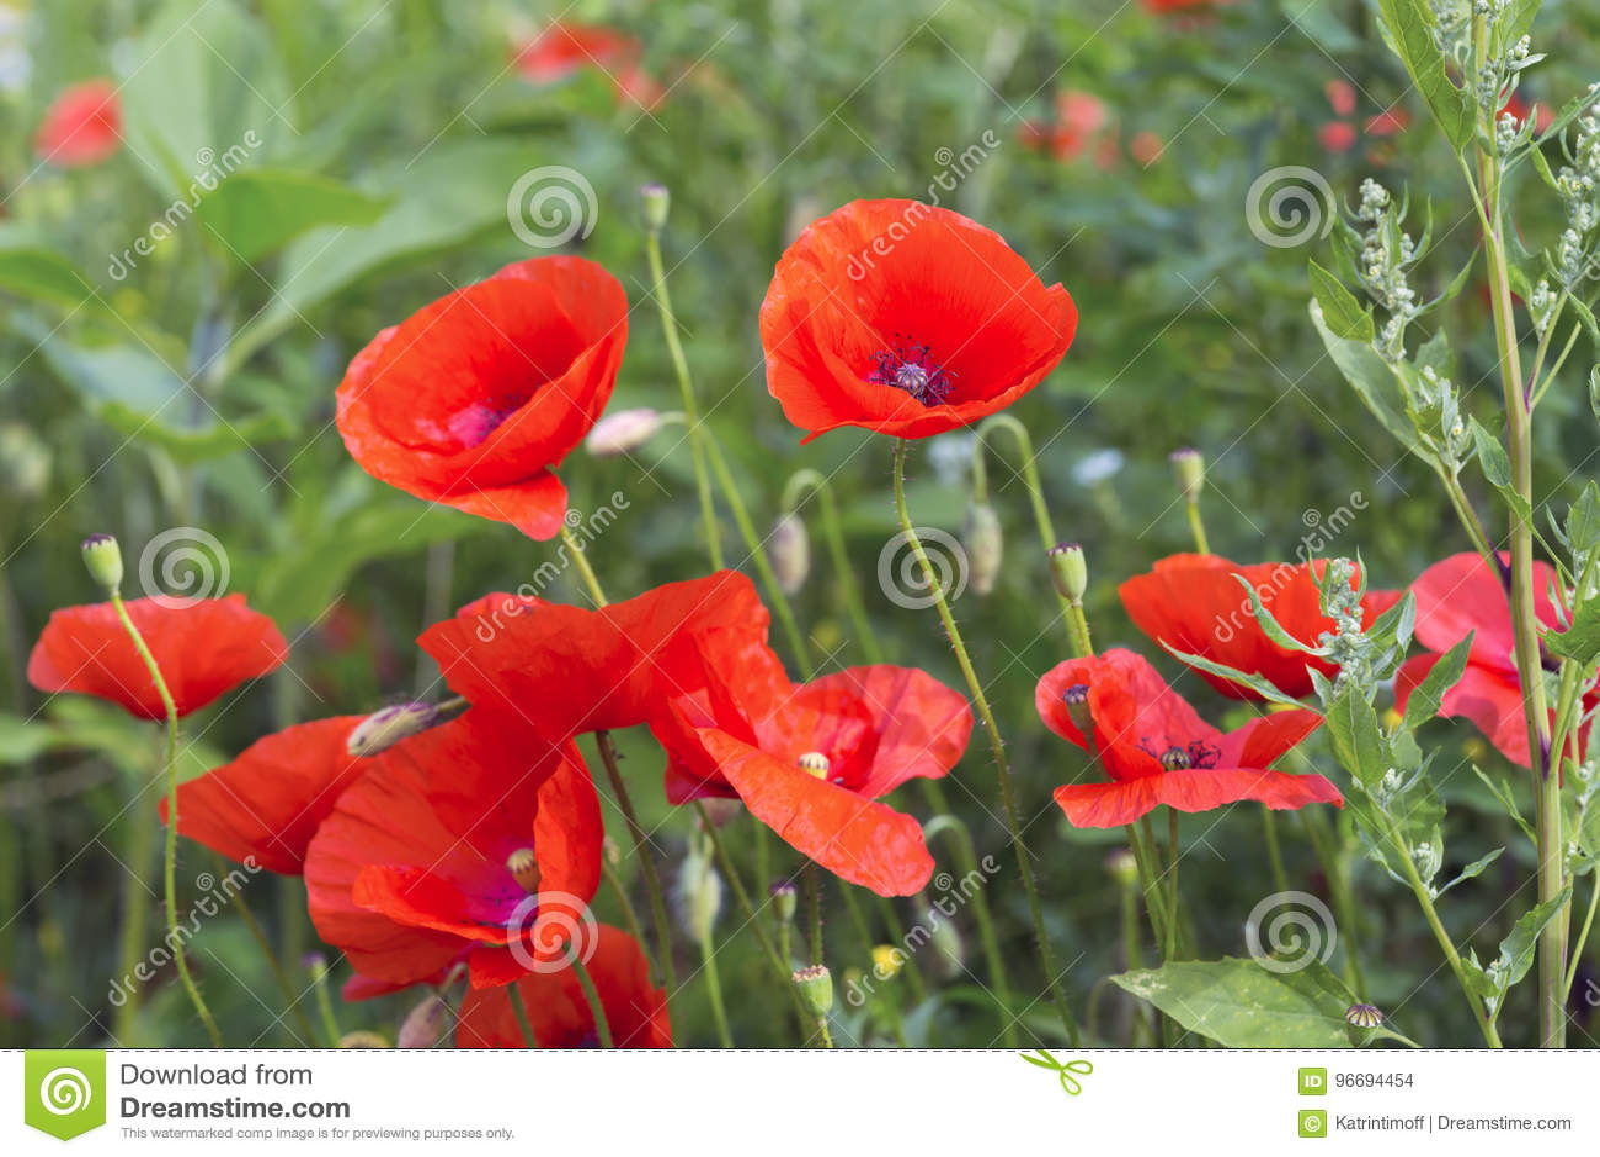 Opium Poppy Papaver Somniferum Flower Stock Photo Image Of Plant